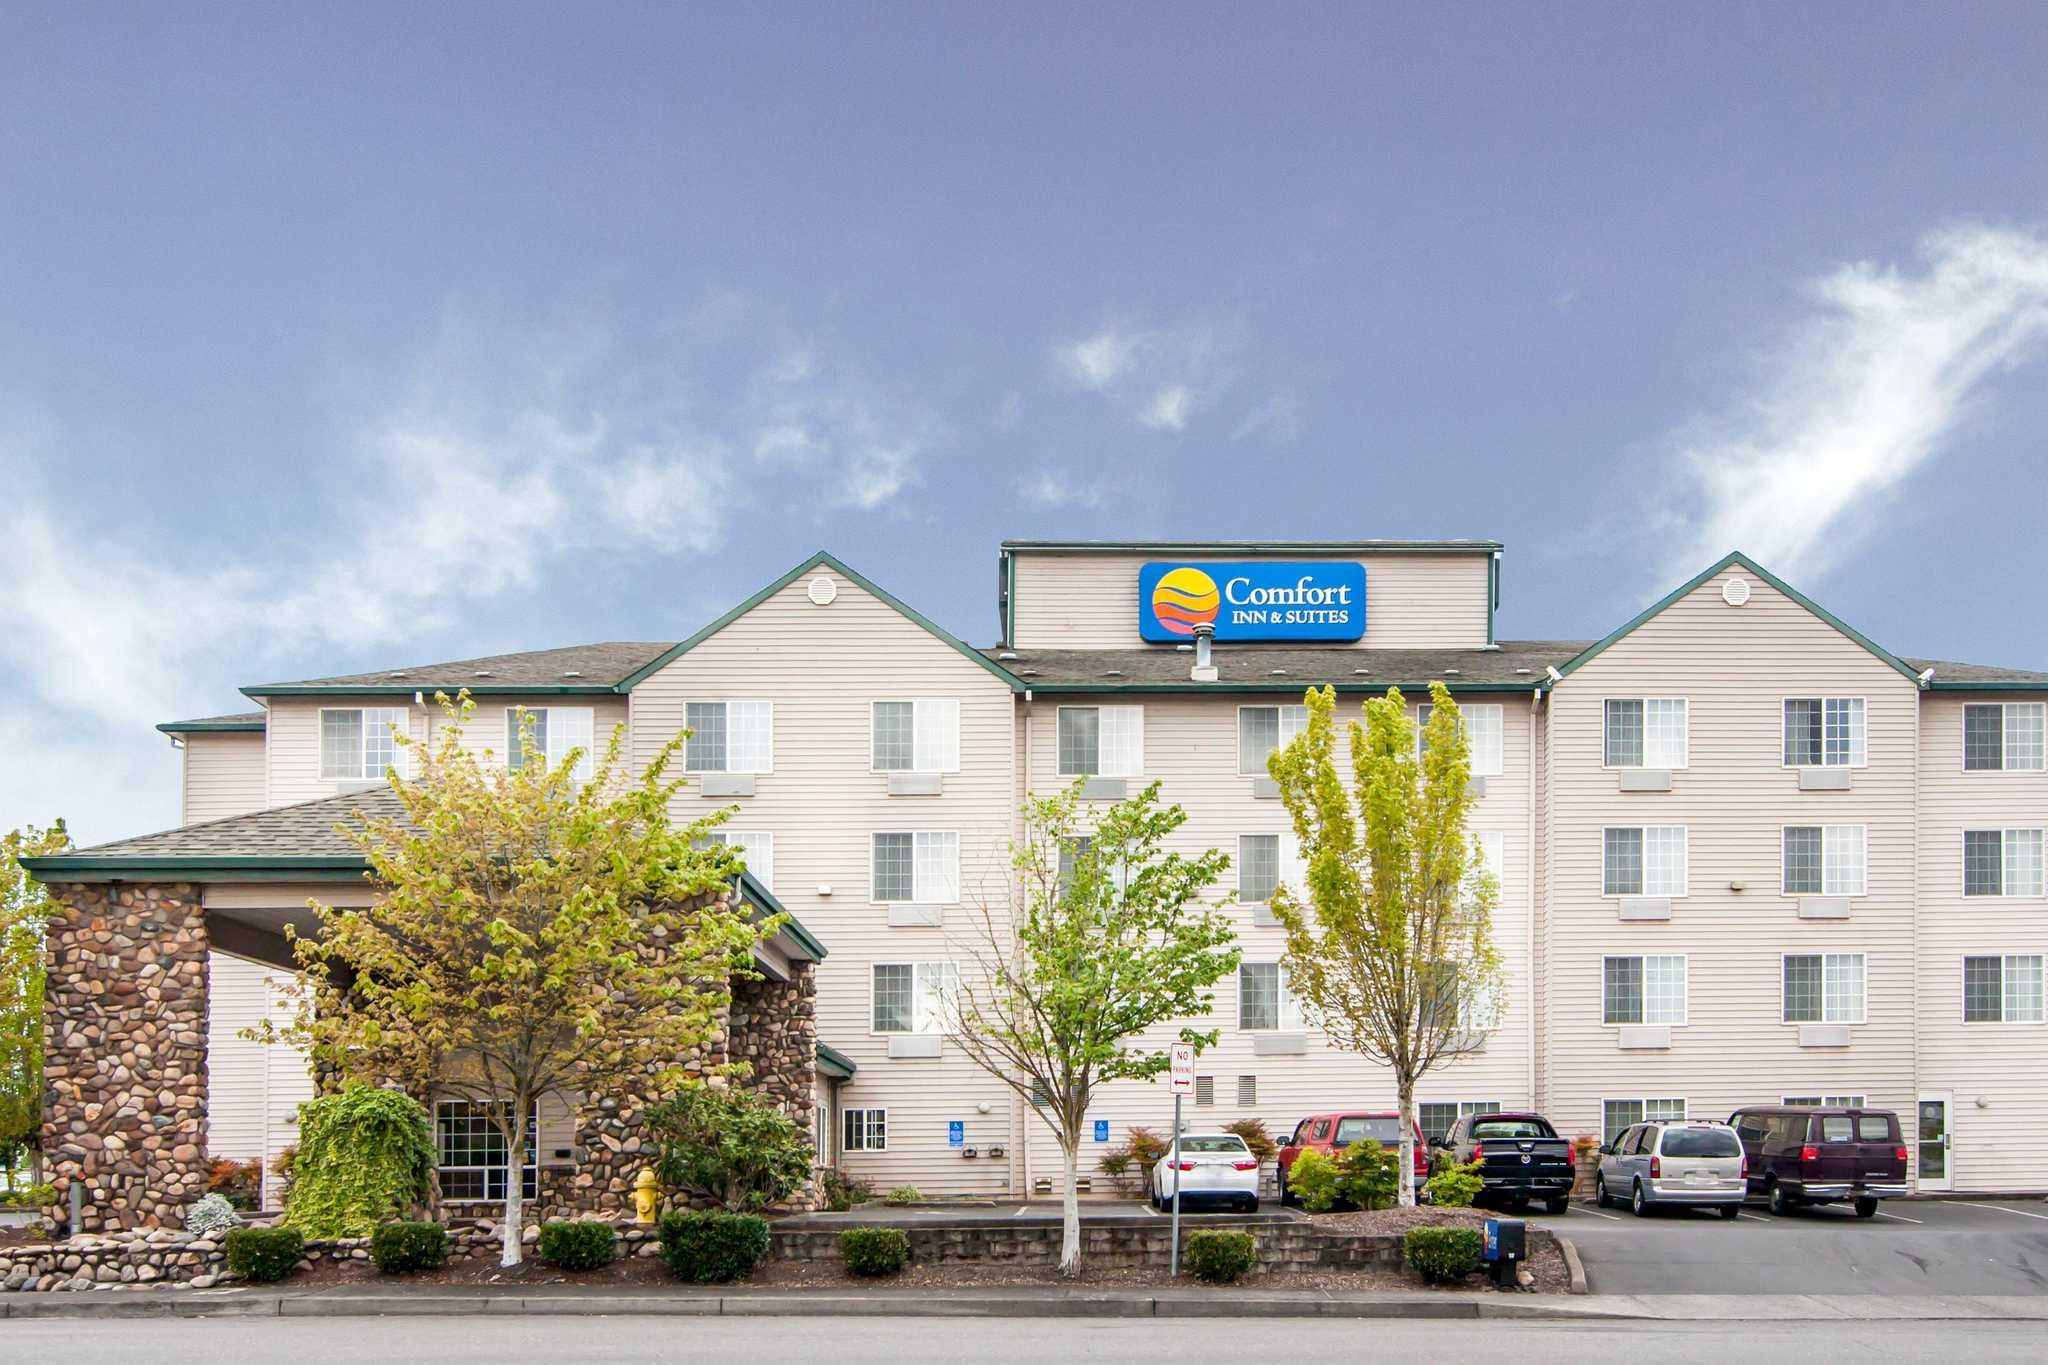 Comfort Inn Amp Suites In Salem Or 503 588 0